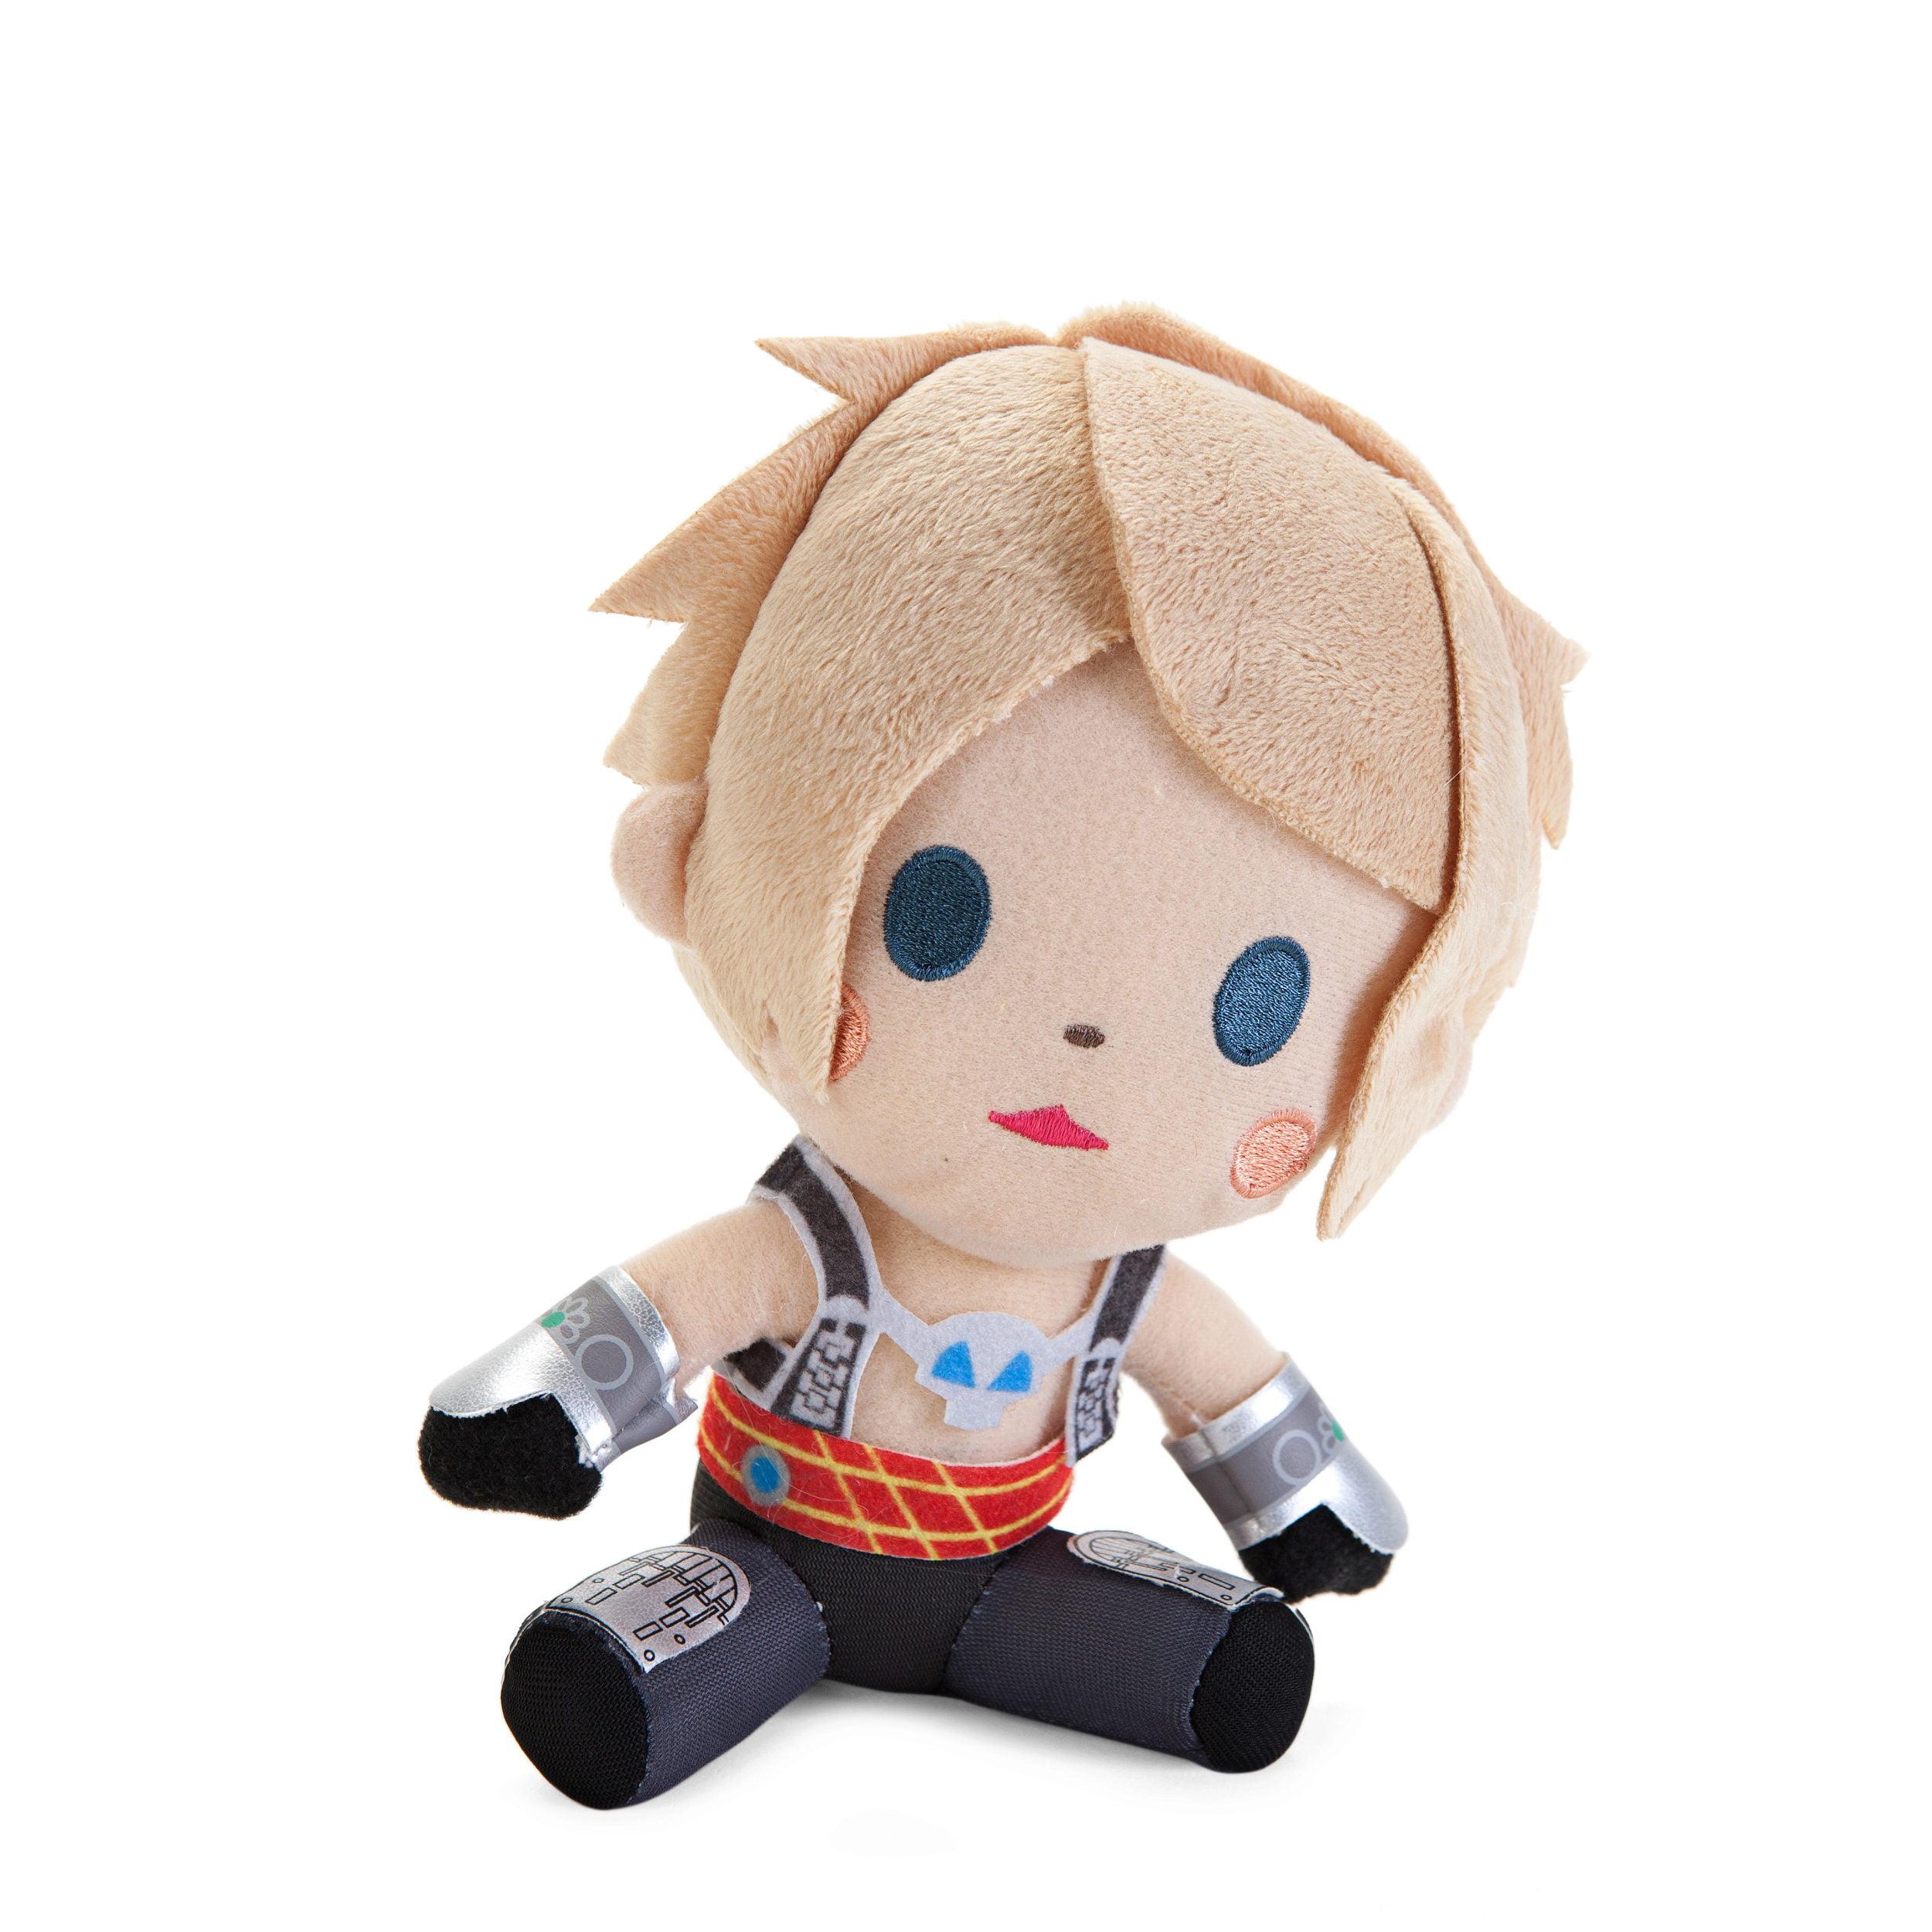 Hatsune Miku X Groove Coaster Blinking Miku Face Plush Toy